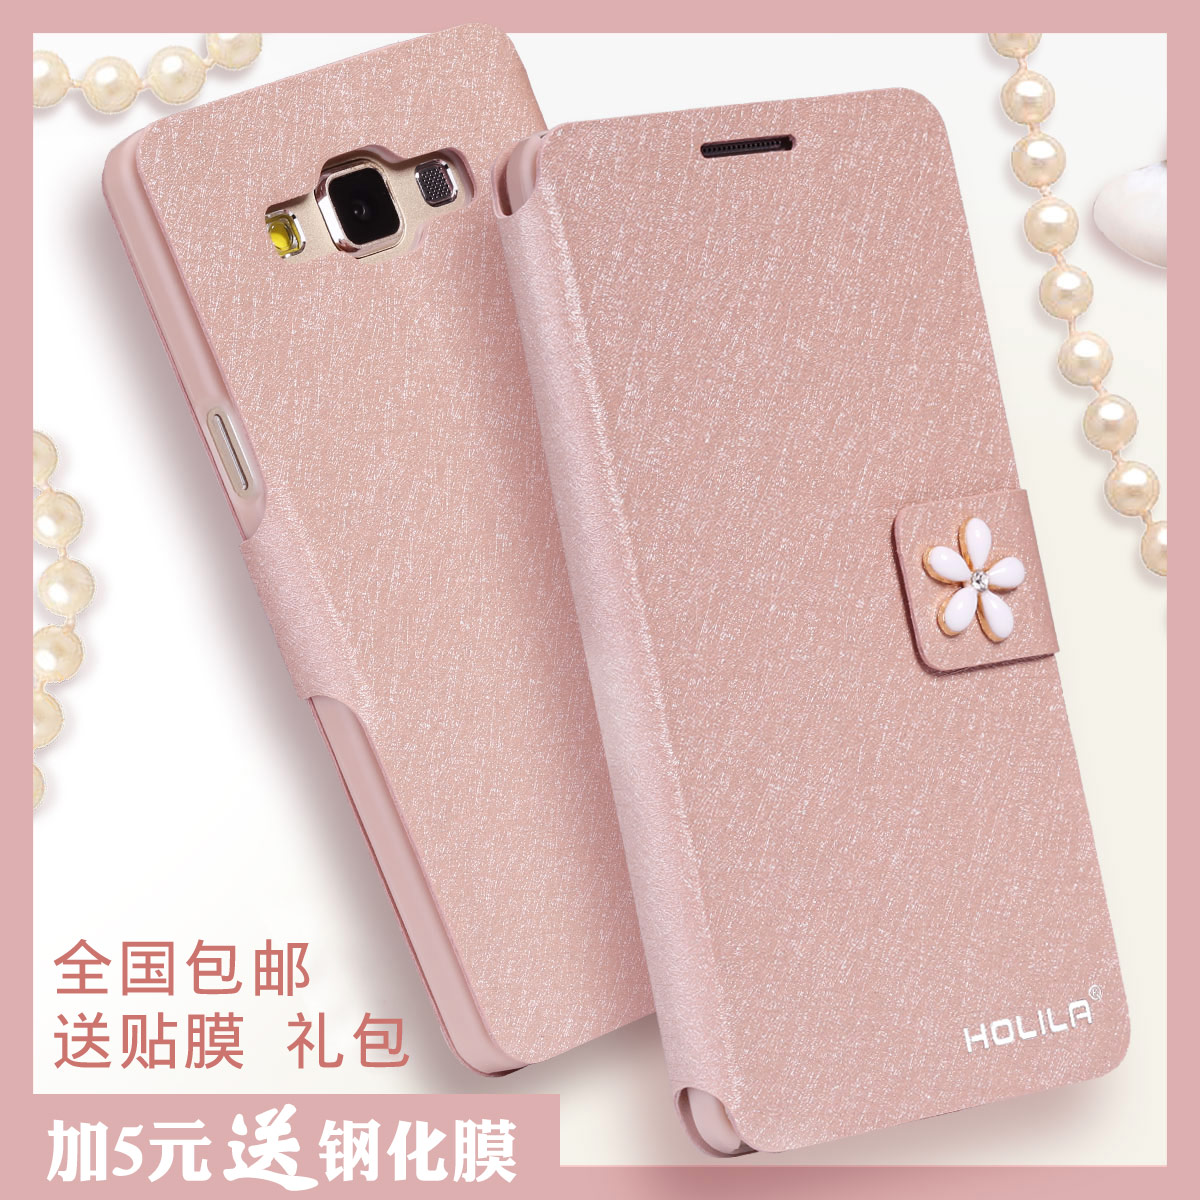 HOLILA 三星A5手机套SM-A5000手机壳A5009皮套GalaxyA5保护外壳套